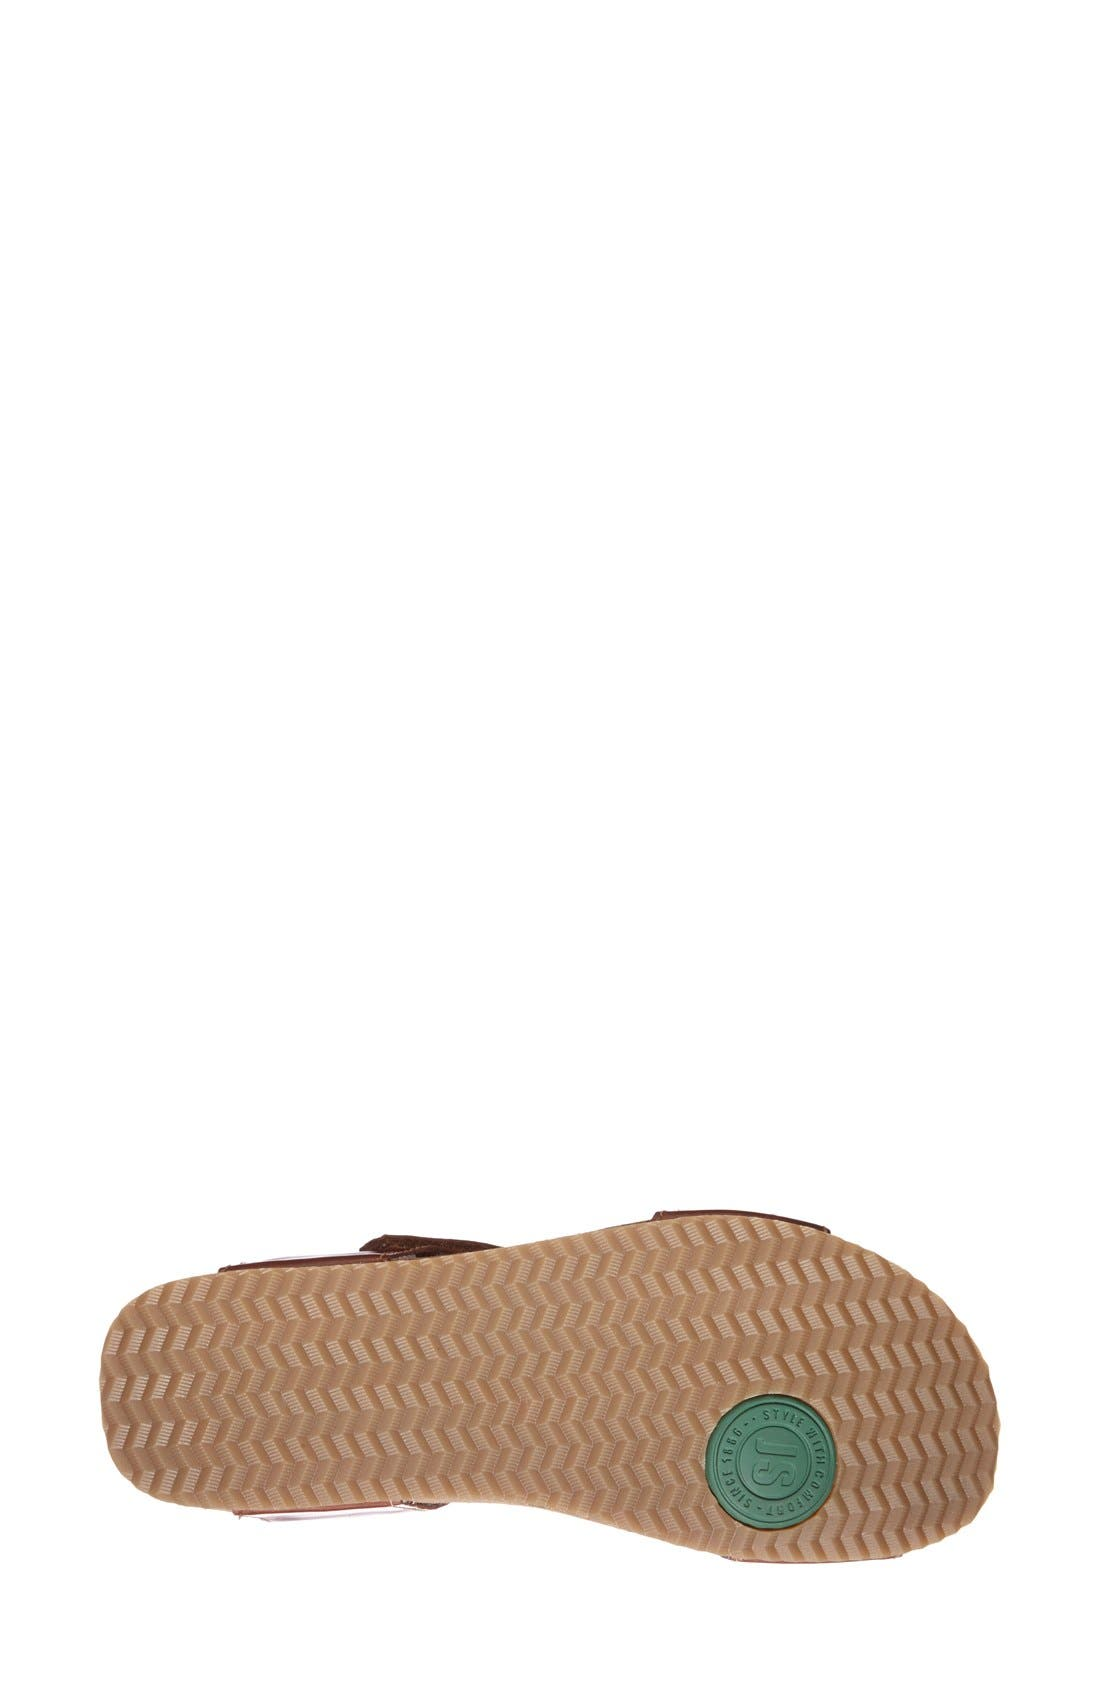 Alternate Image 4  - Josef Seibel 'Tonga' Leather Sandal (Women)